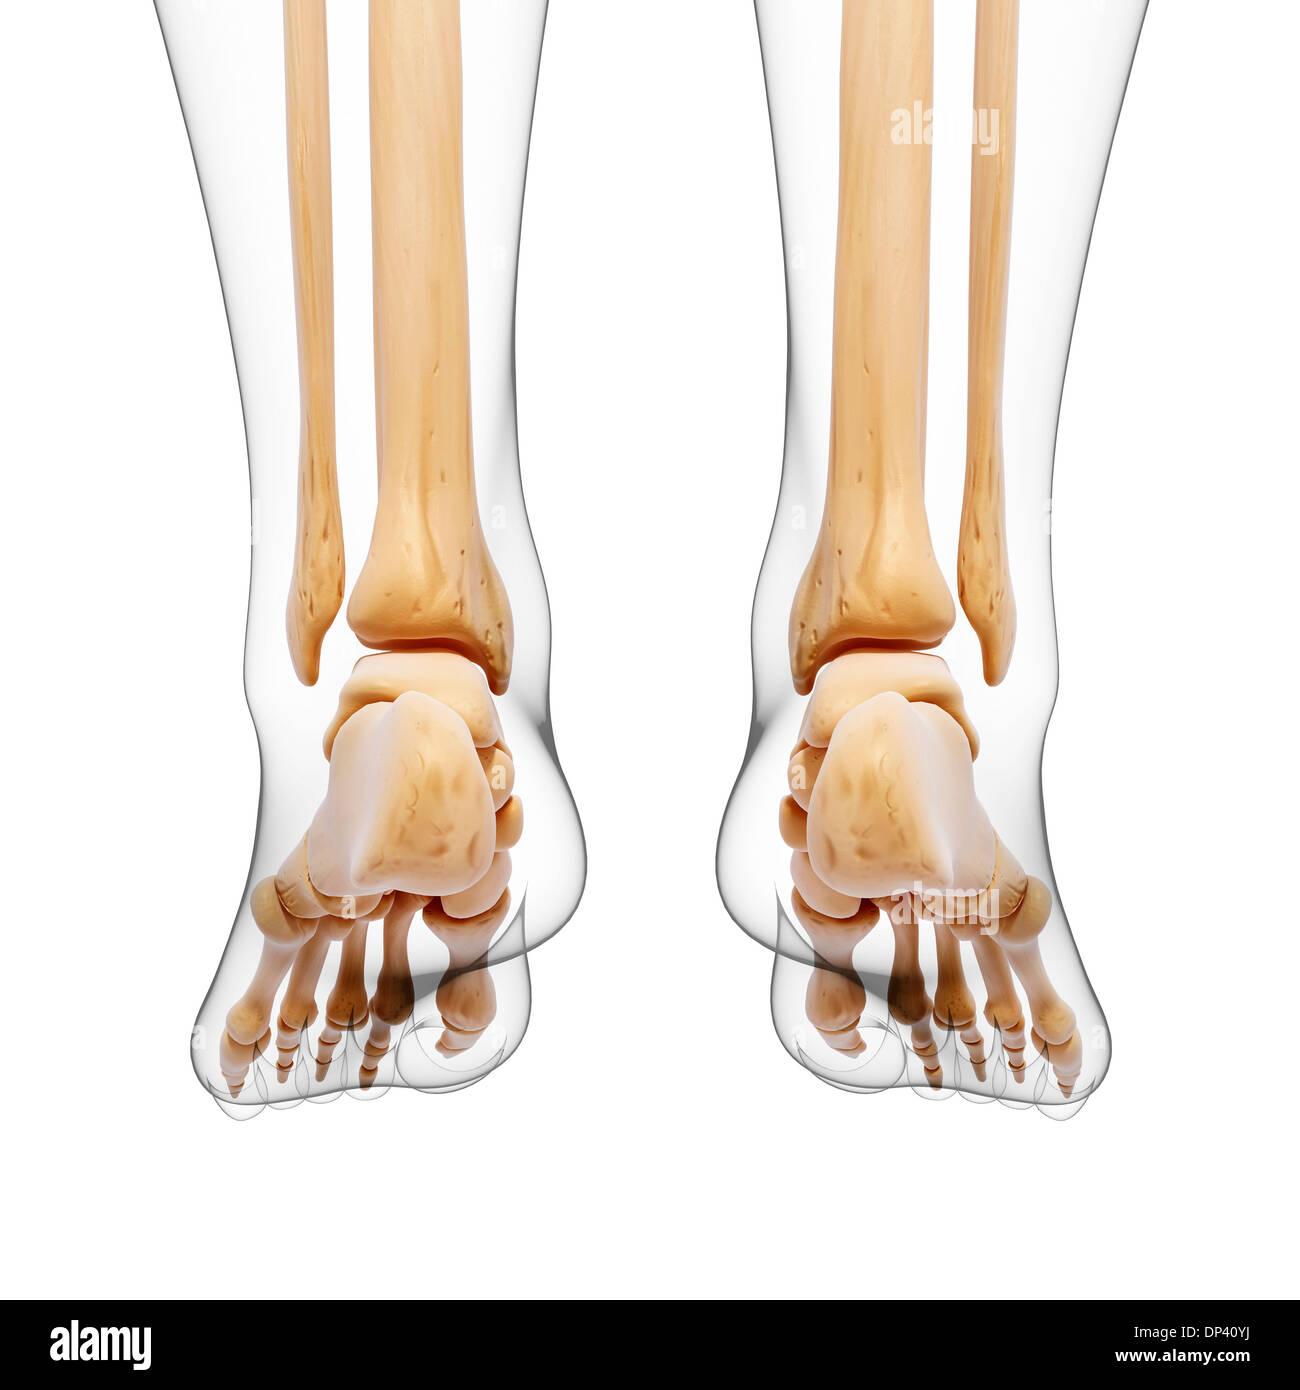 Los huesos de la pierna humana, obras de arte Foto & Imagen De Stock ...